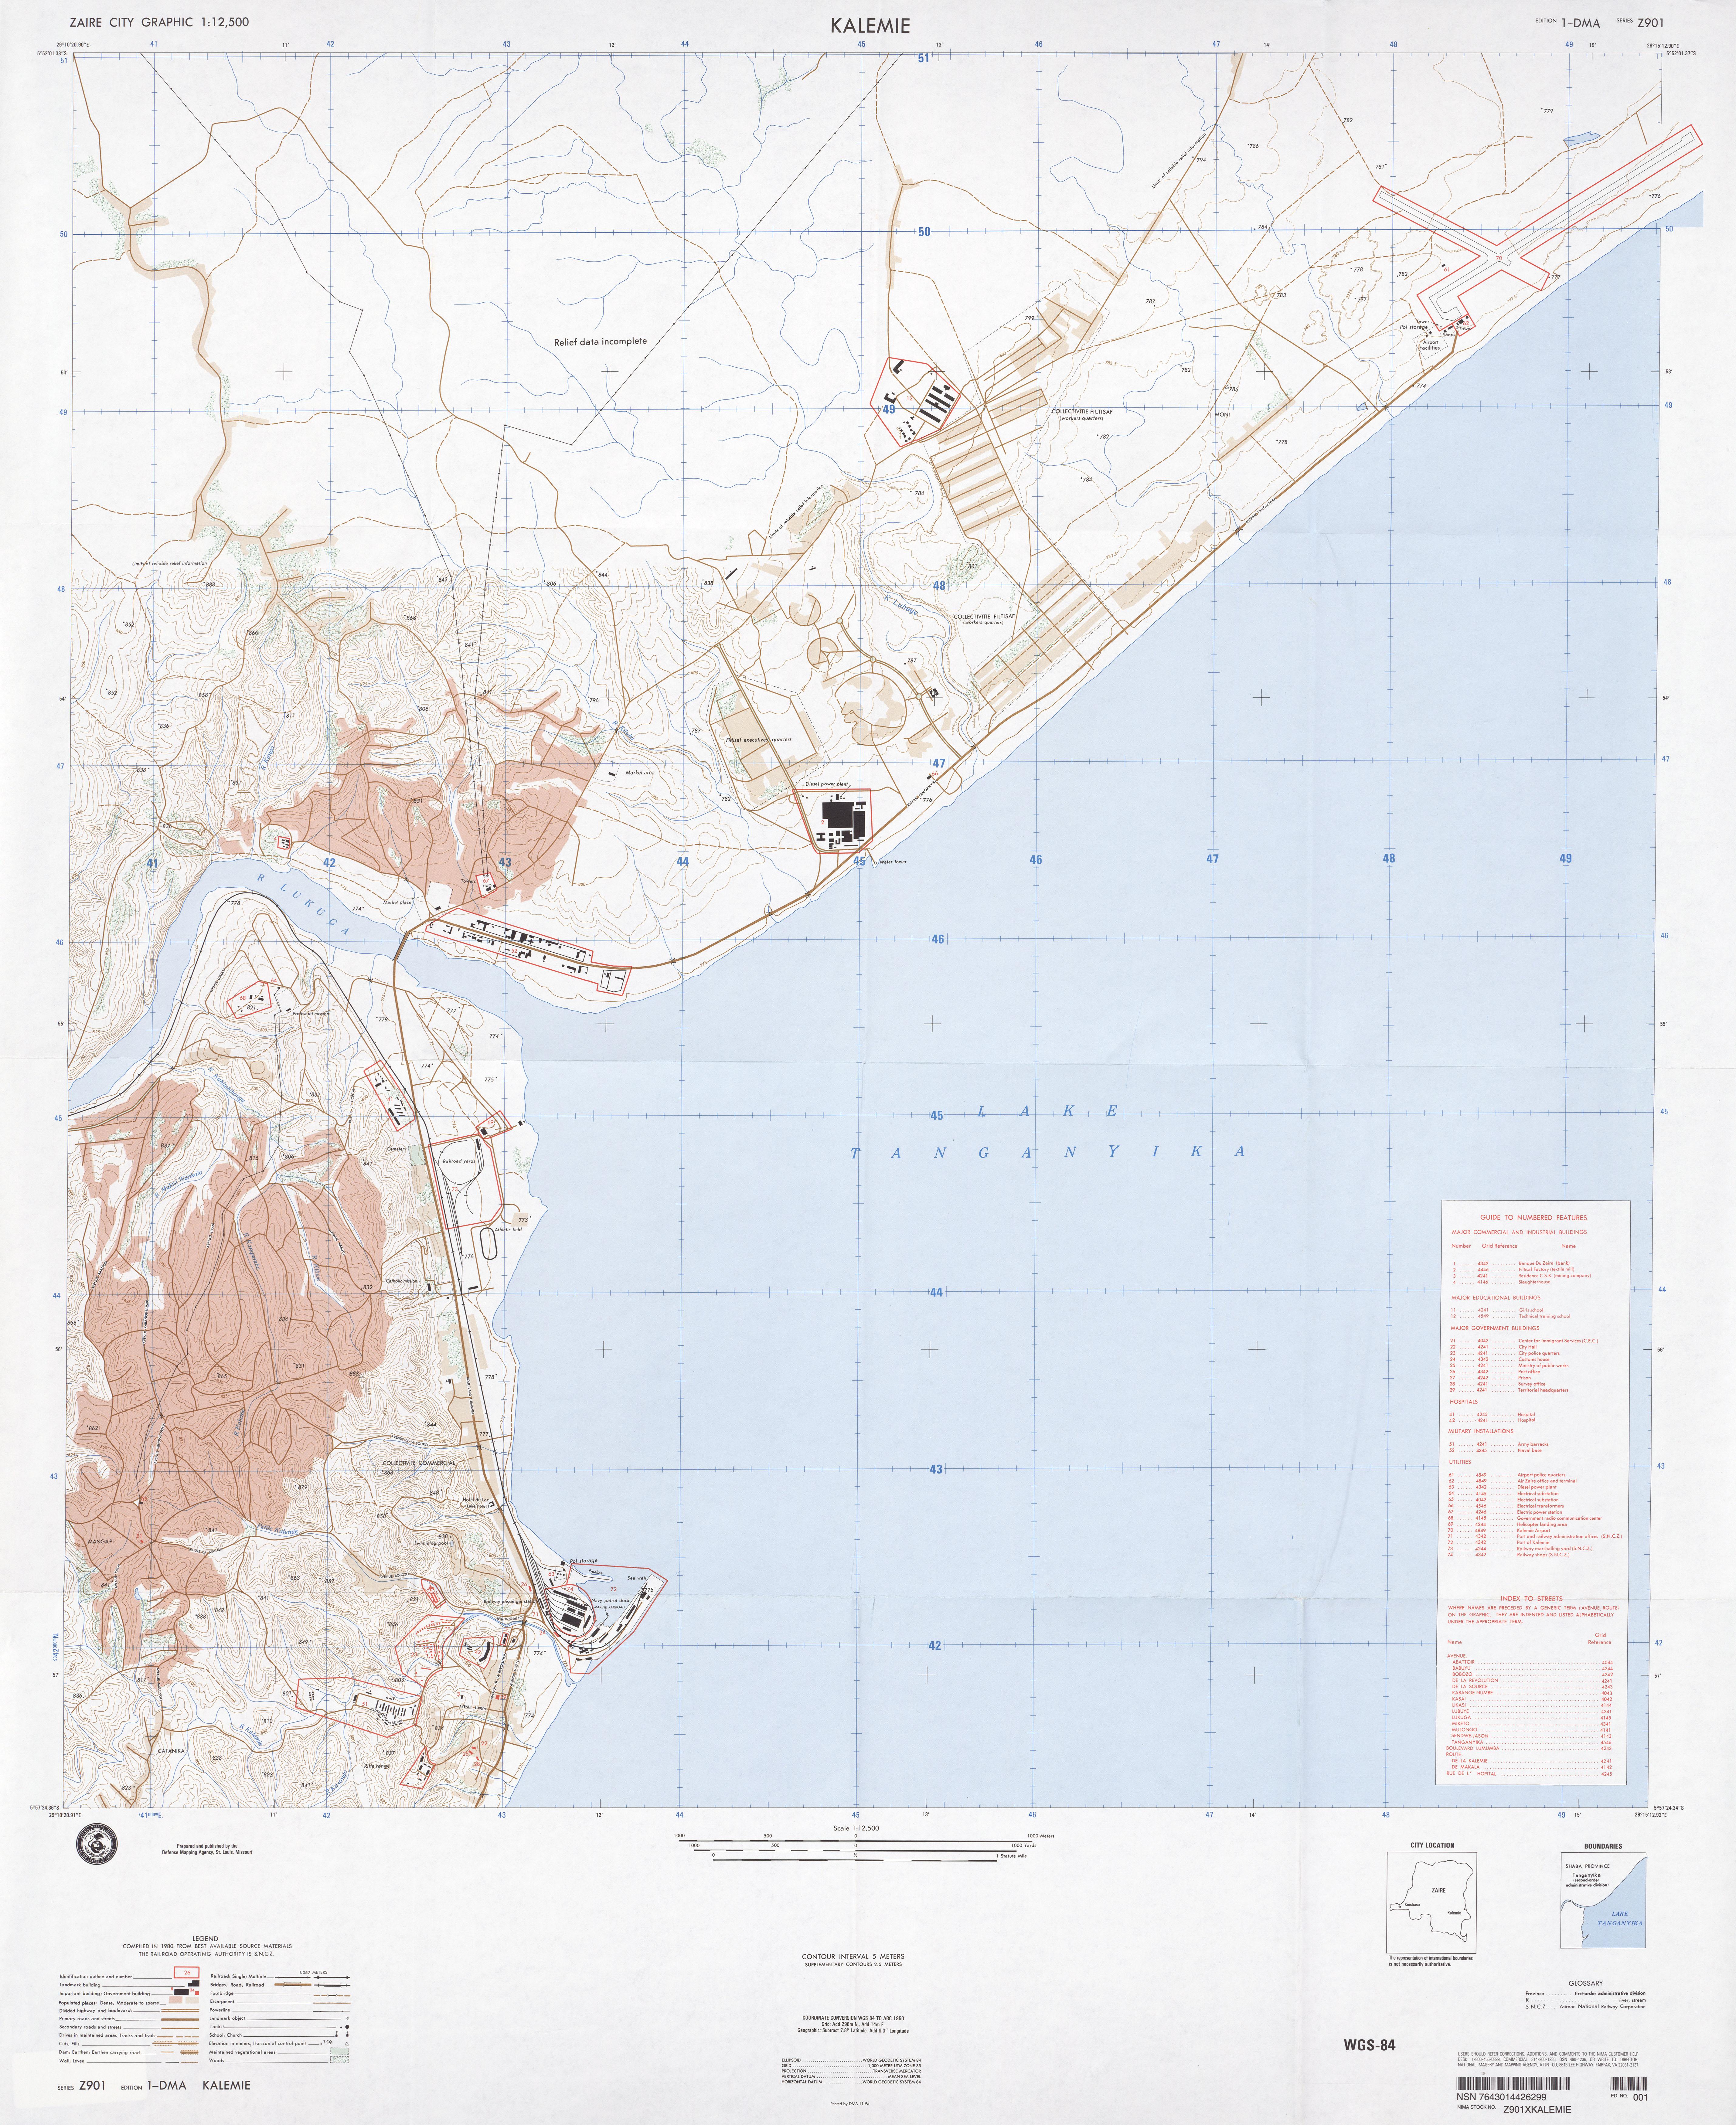 Congo Democratic Republic Maps PerryCastañeda Map Collection - Dma map us 2016